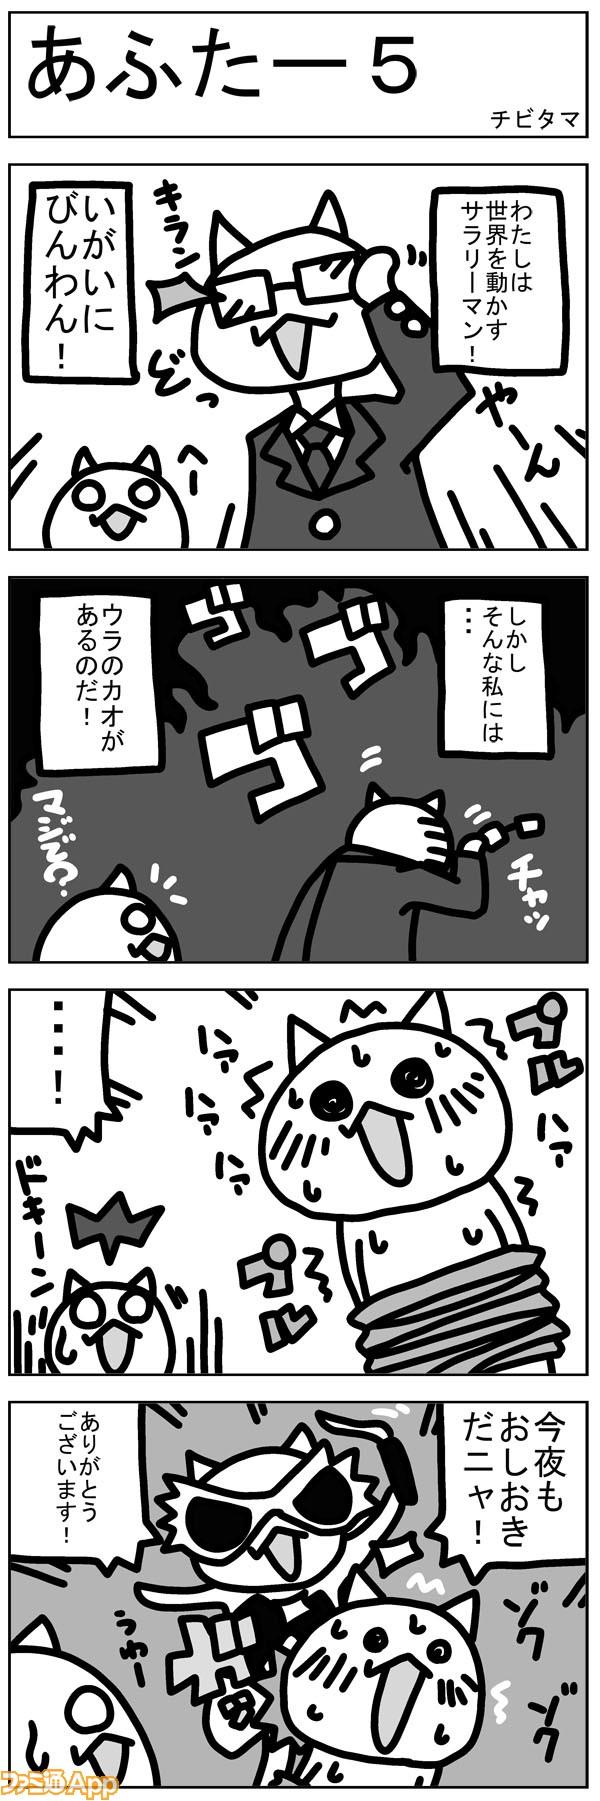 13tibi_005